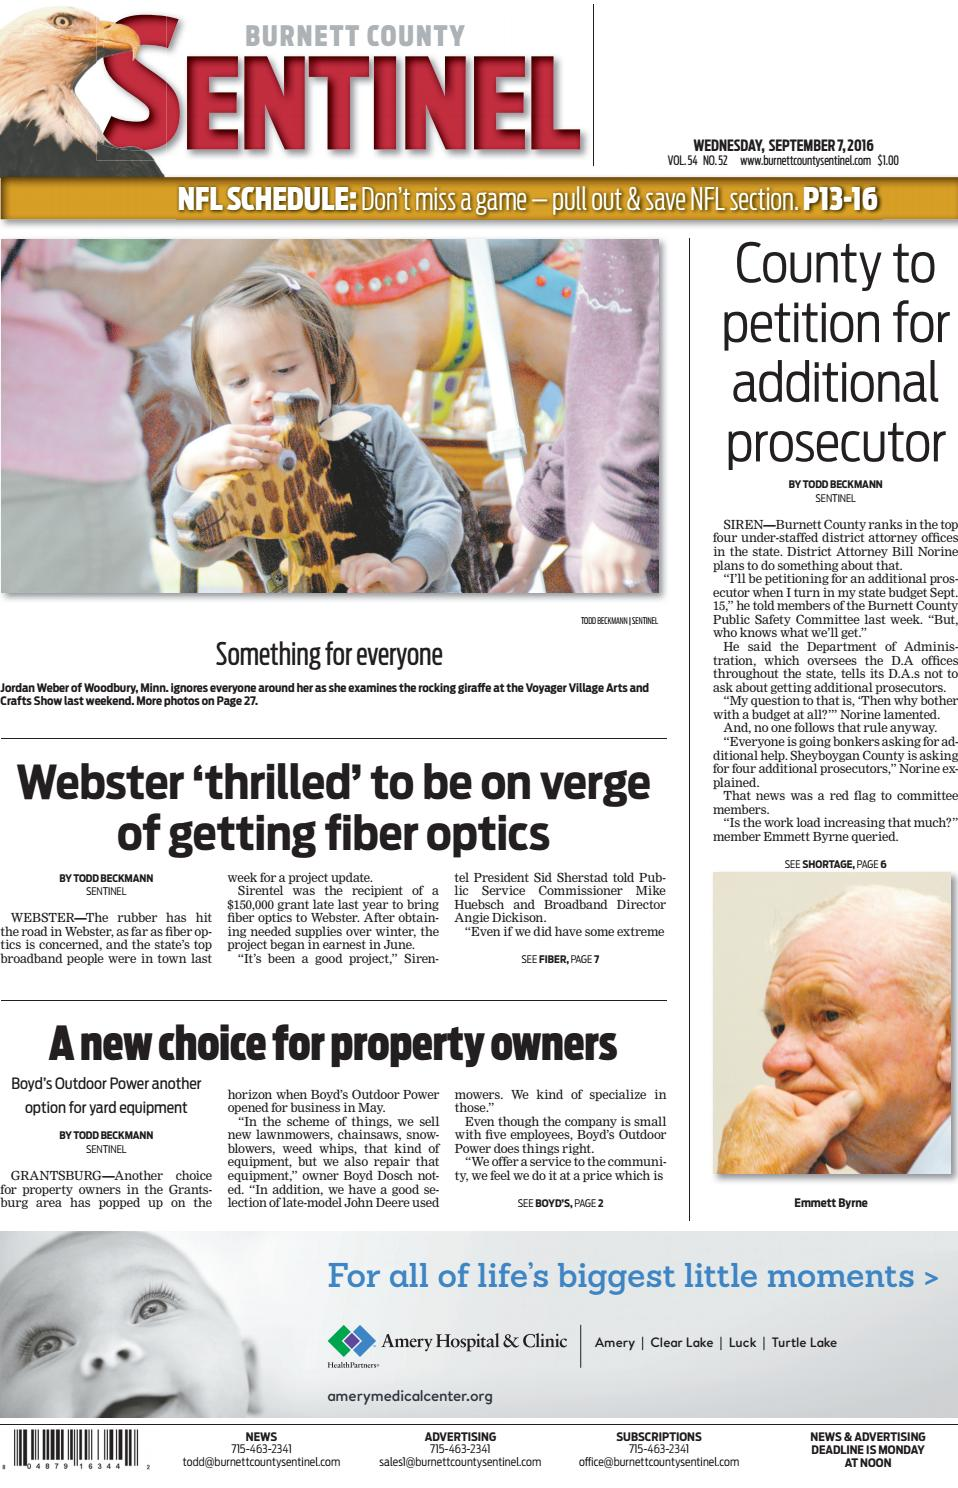 Burnett County Sentinel 9.7.16 by Burnett County Sentinel - issuu c9cb335508e5b